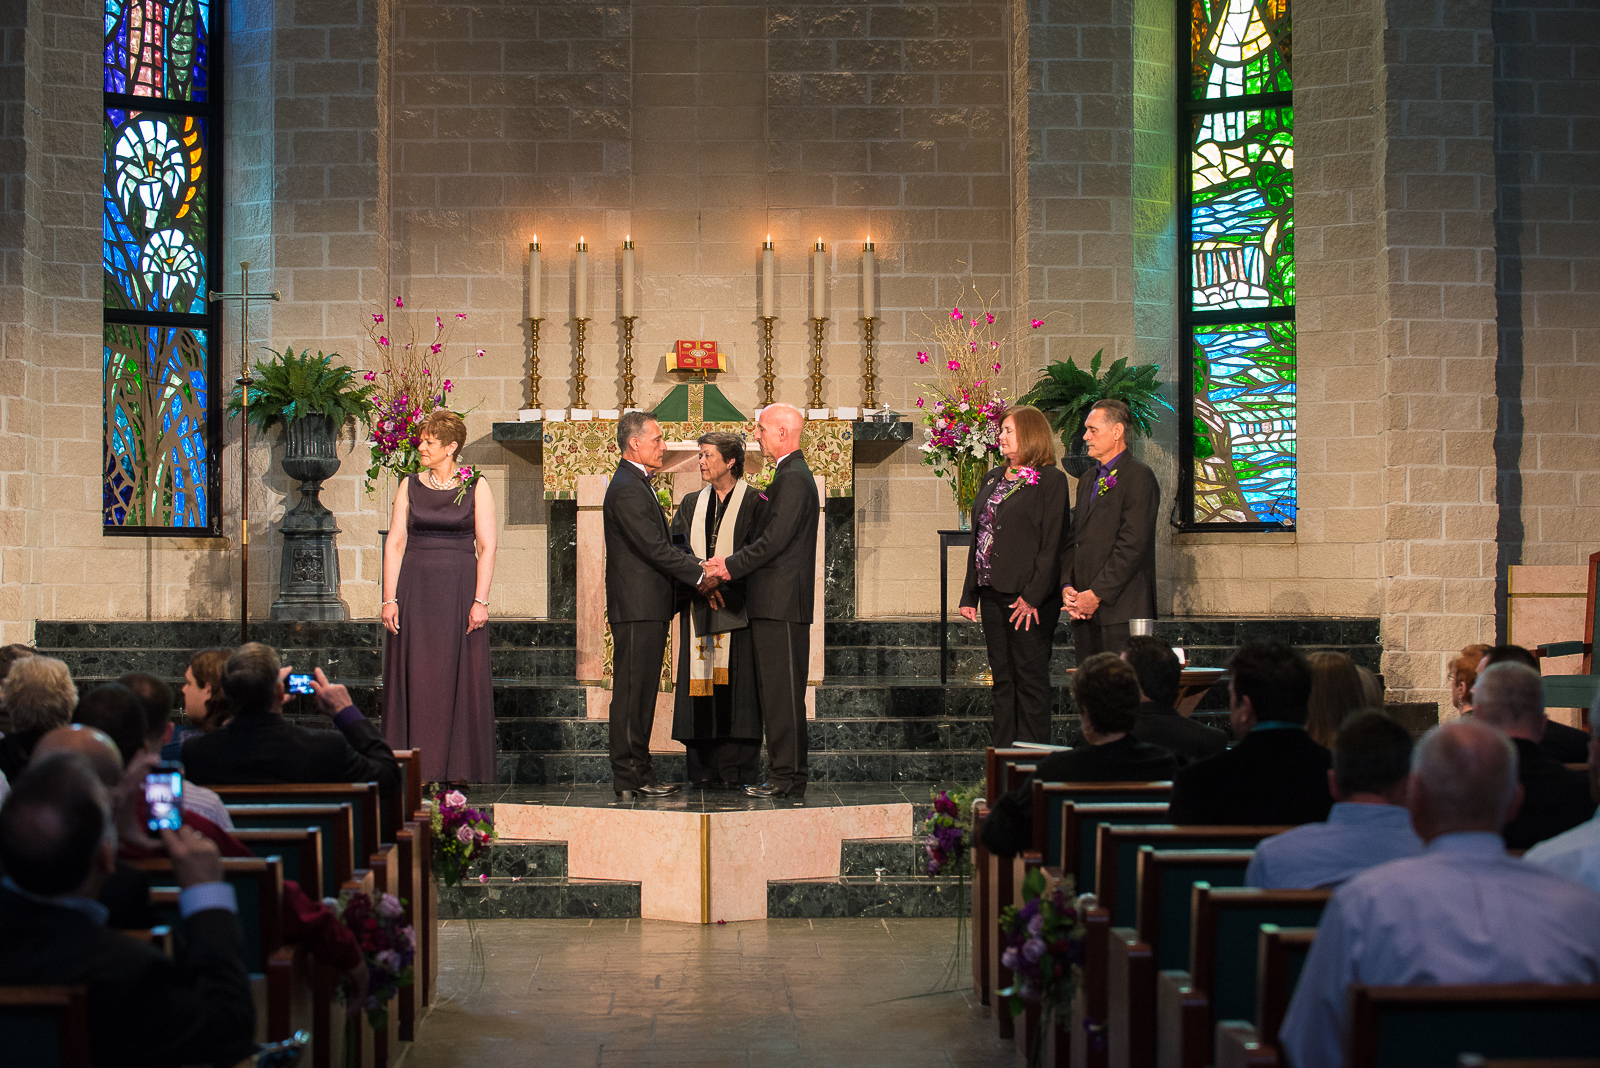 Michael-Napier-Weddings-Ludwig-Guilbeau Wedding-20 (14).jpg